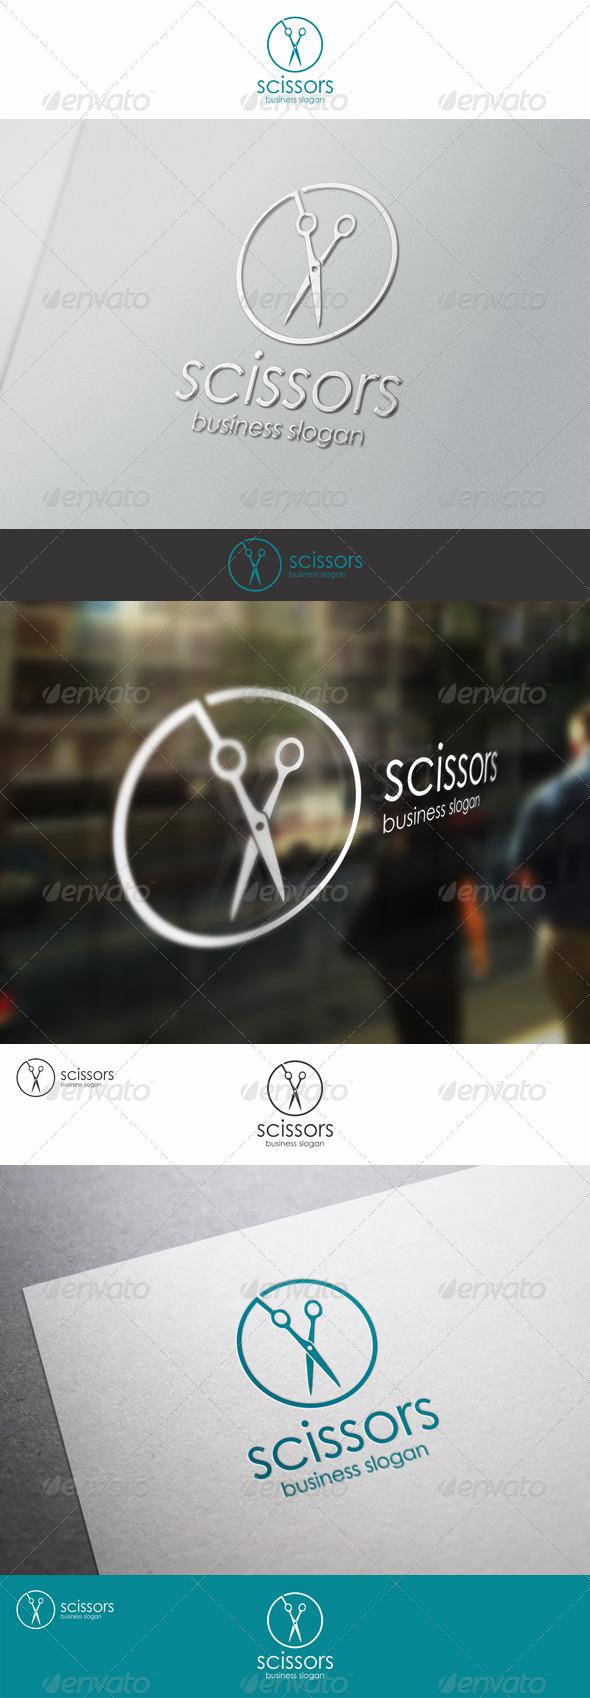 Scissors - Barber Shop Logo Template - Objects Logo Templates